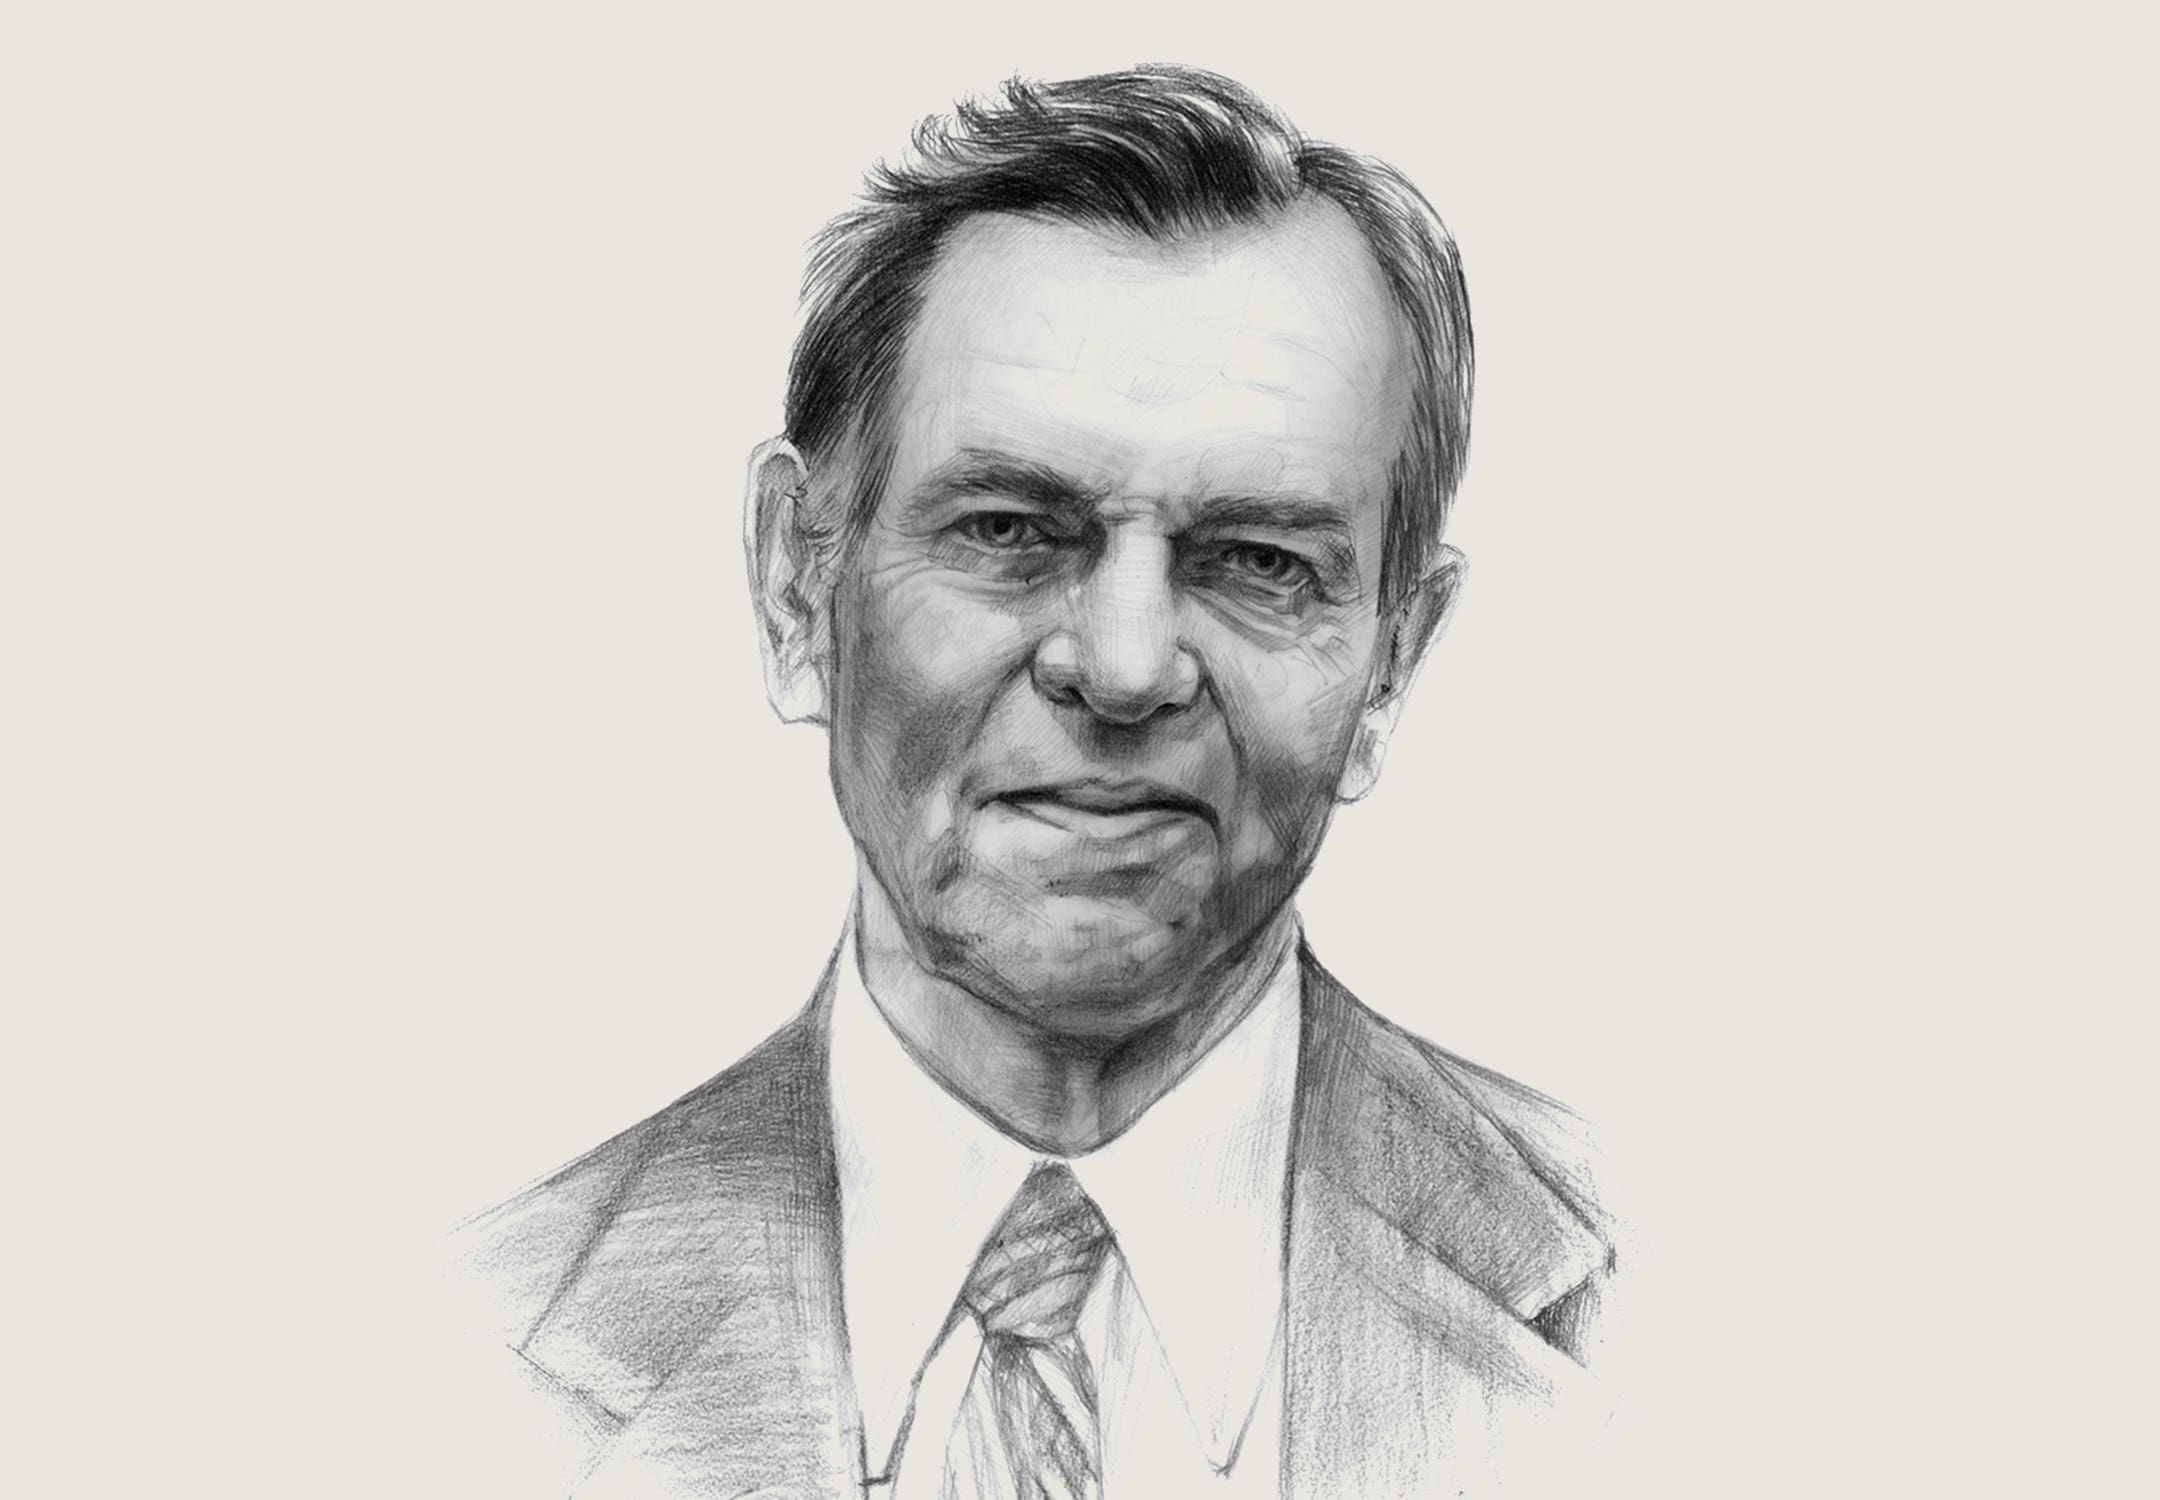 Joseph Campbell Headshot Photo